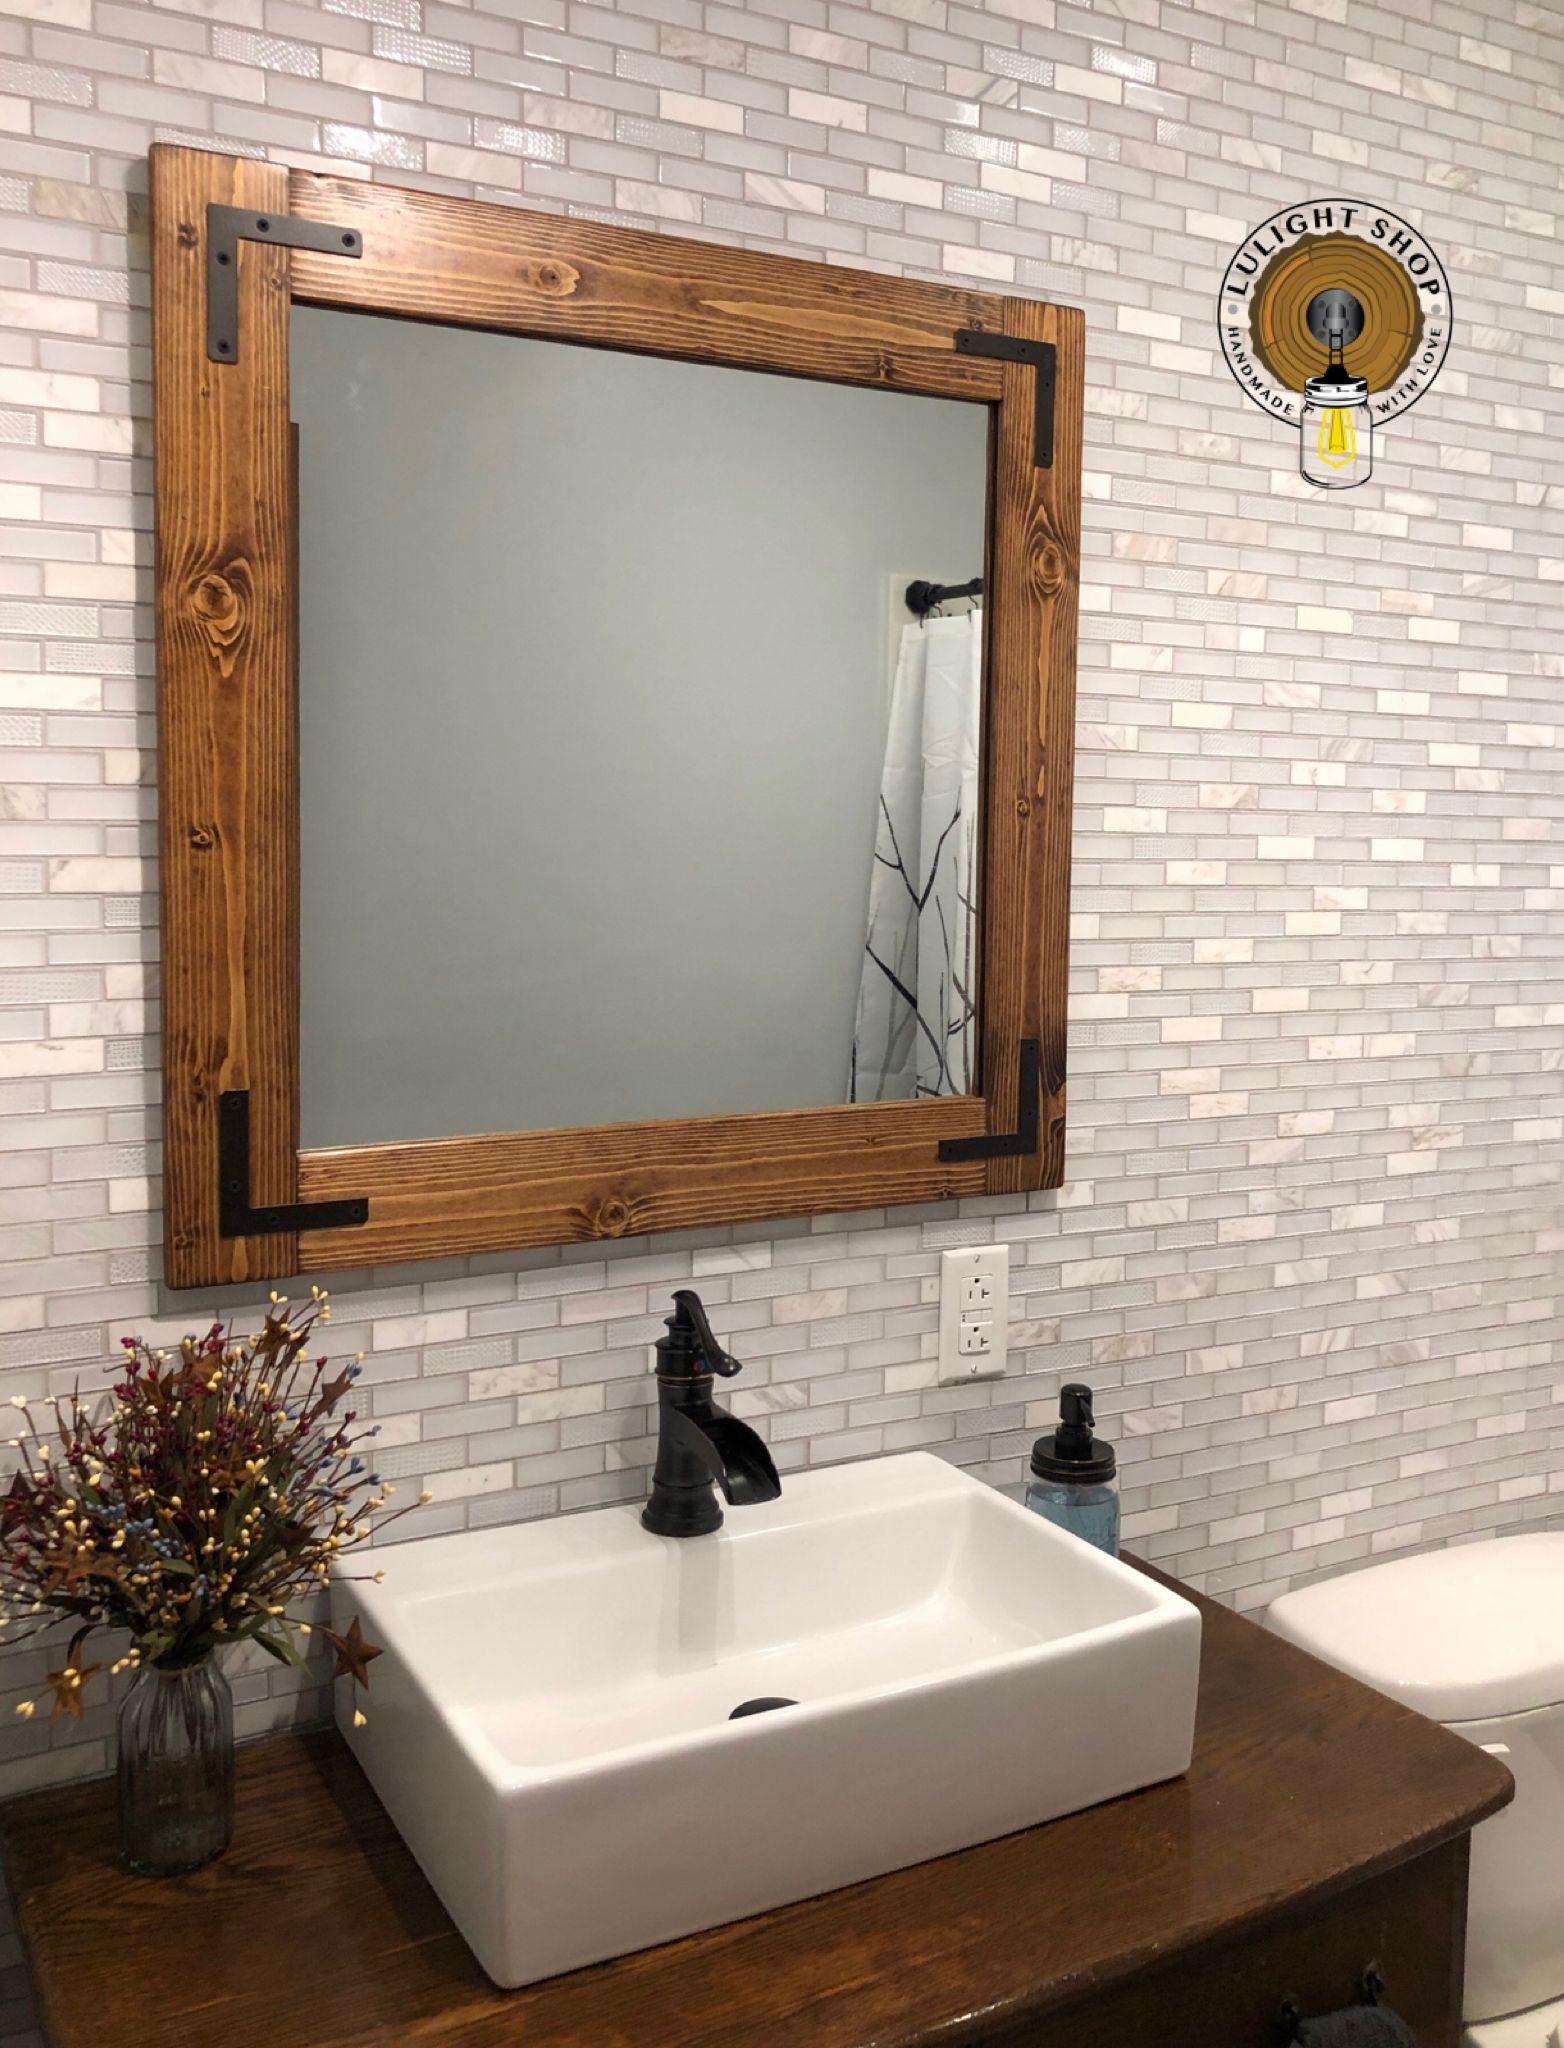 Bathroom Mirror Wood Frame Mirror Wall Mirror Rustic Etsy Wood Framed Mirror Framed Mirror Wall Rustic Mirrors